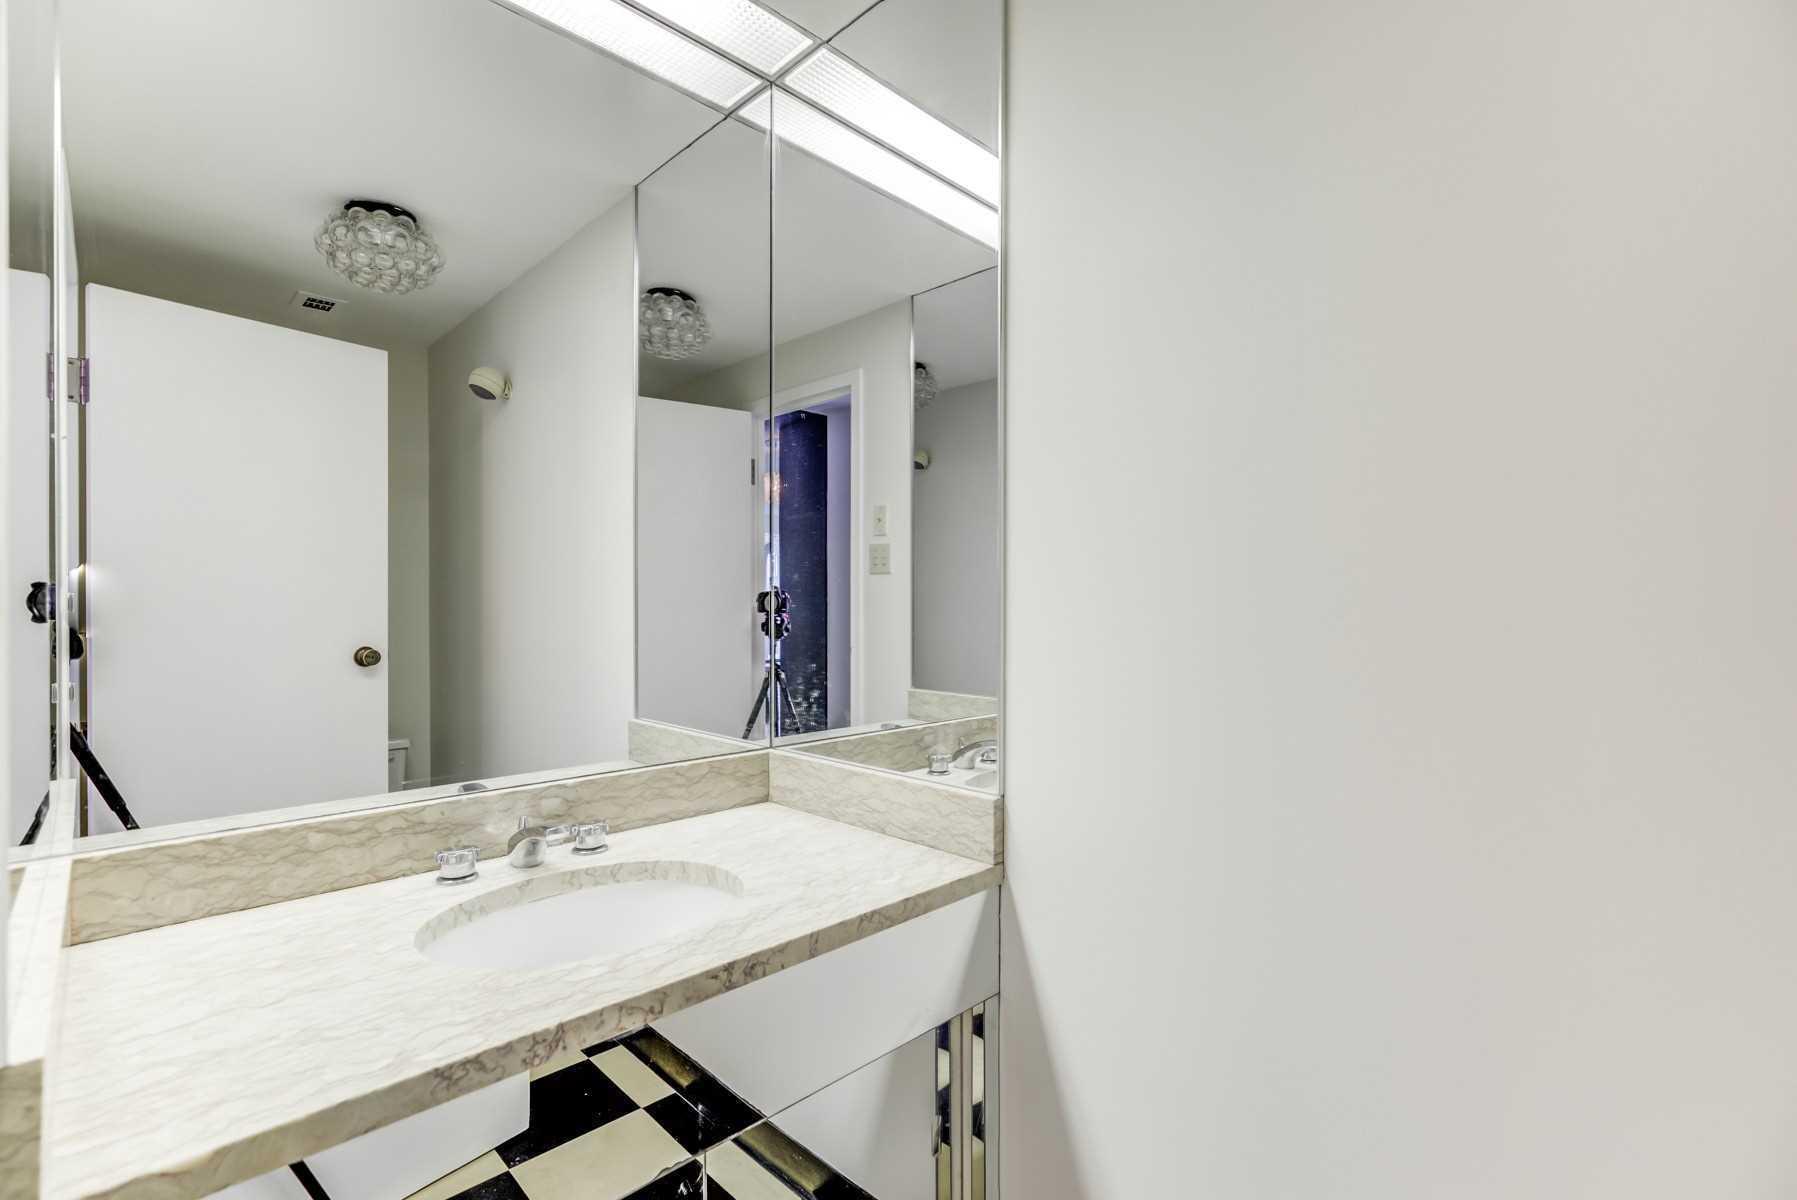 607 - 55A Avenue Rd - Annex Condo Apt for sale, 2 Bedrooms (C5185690) - #21